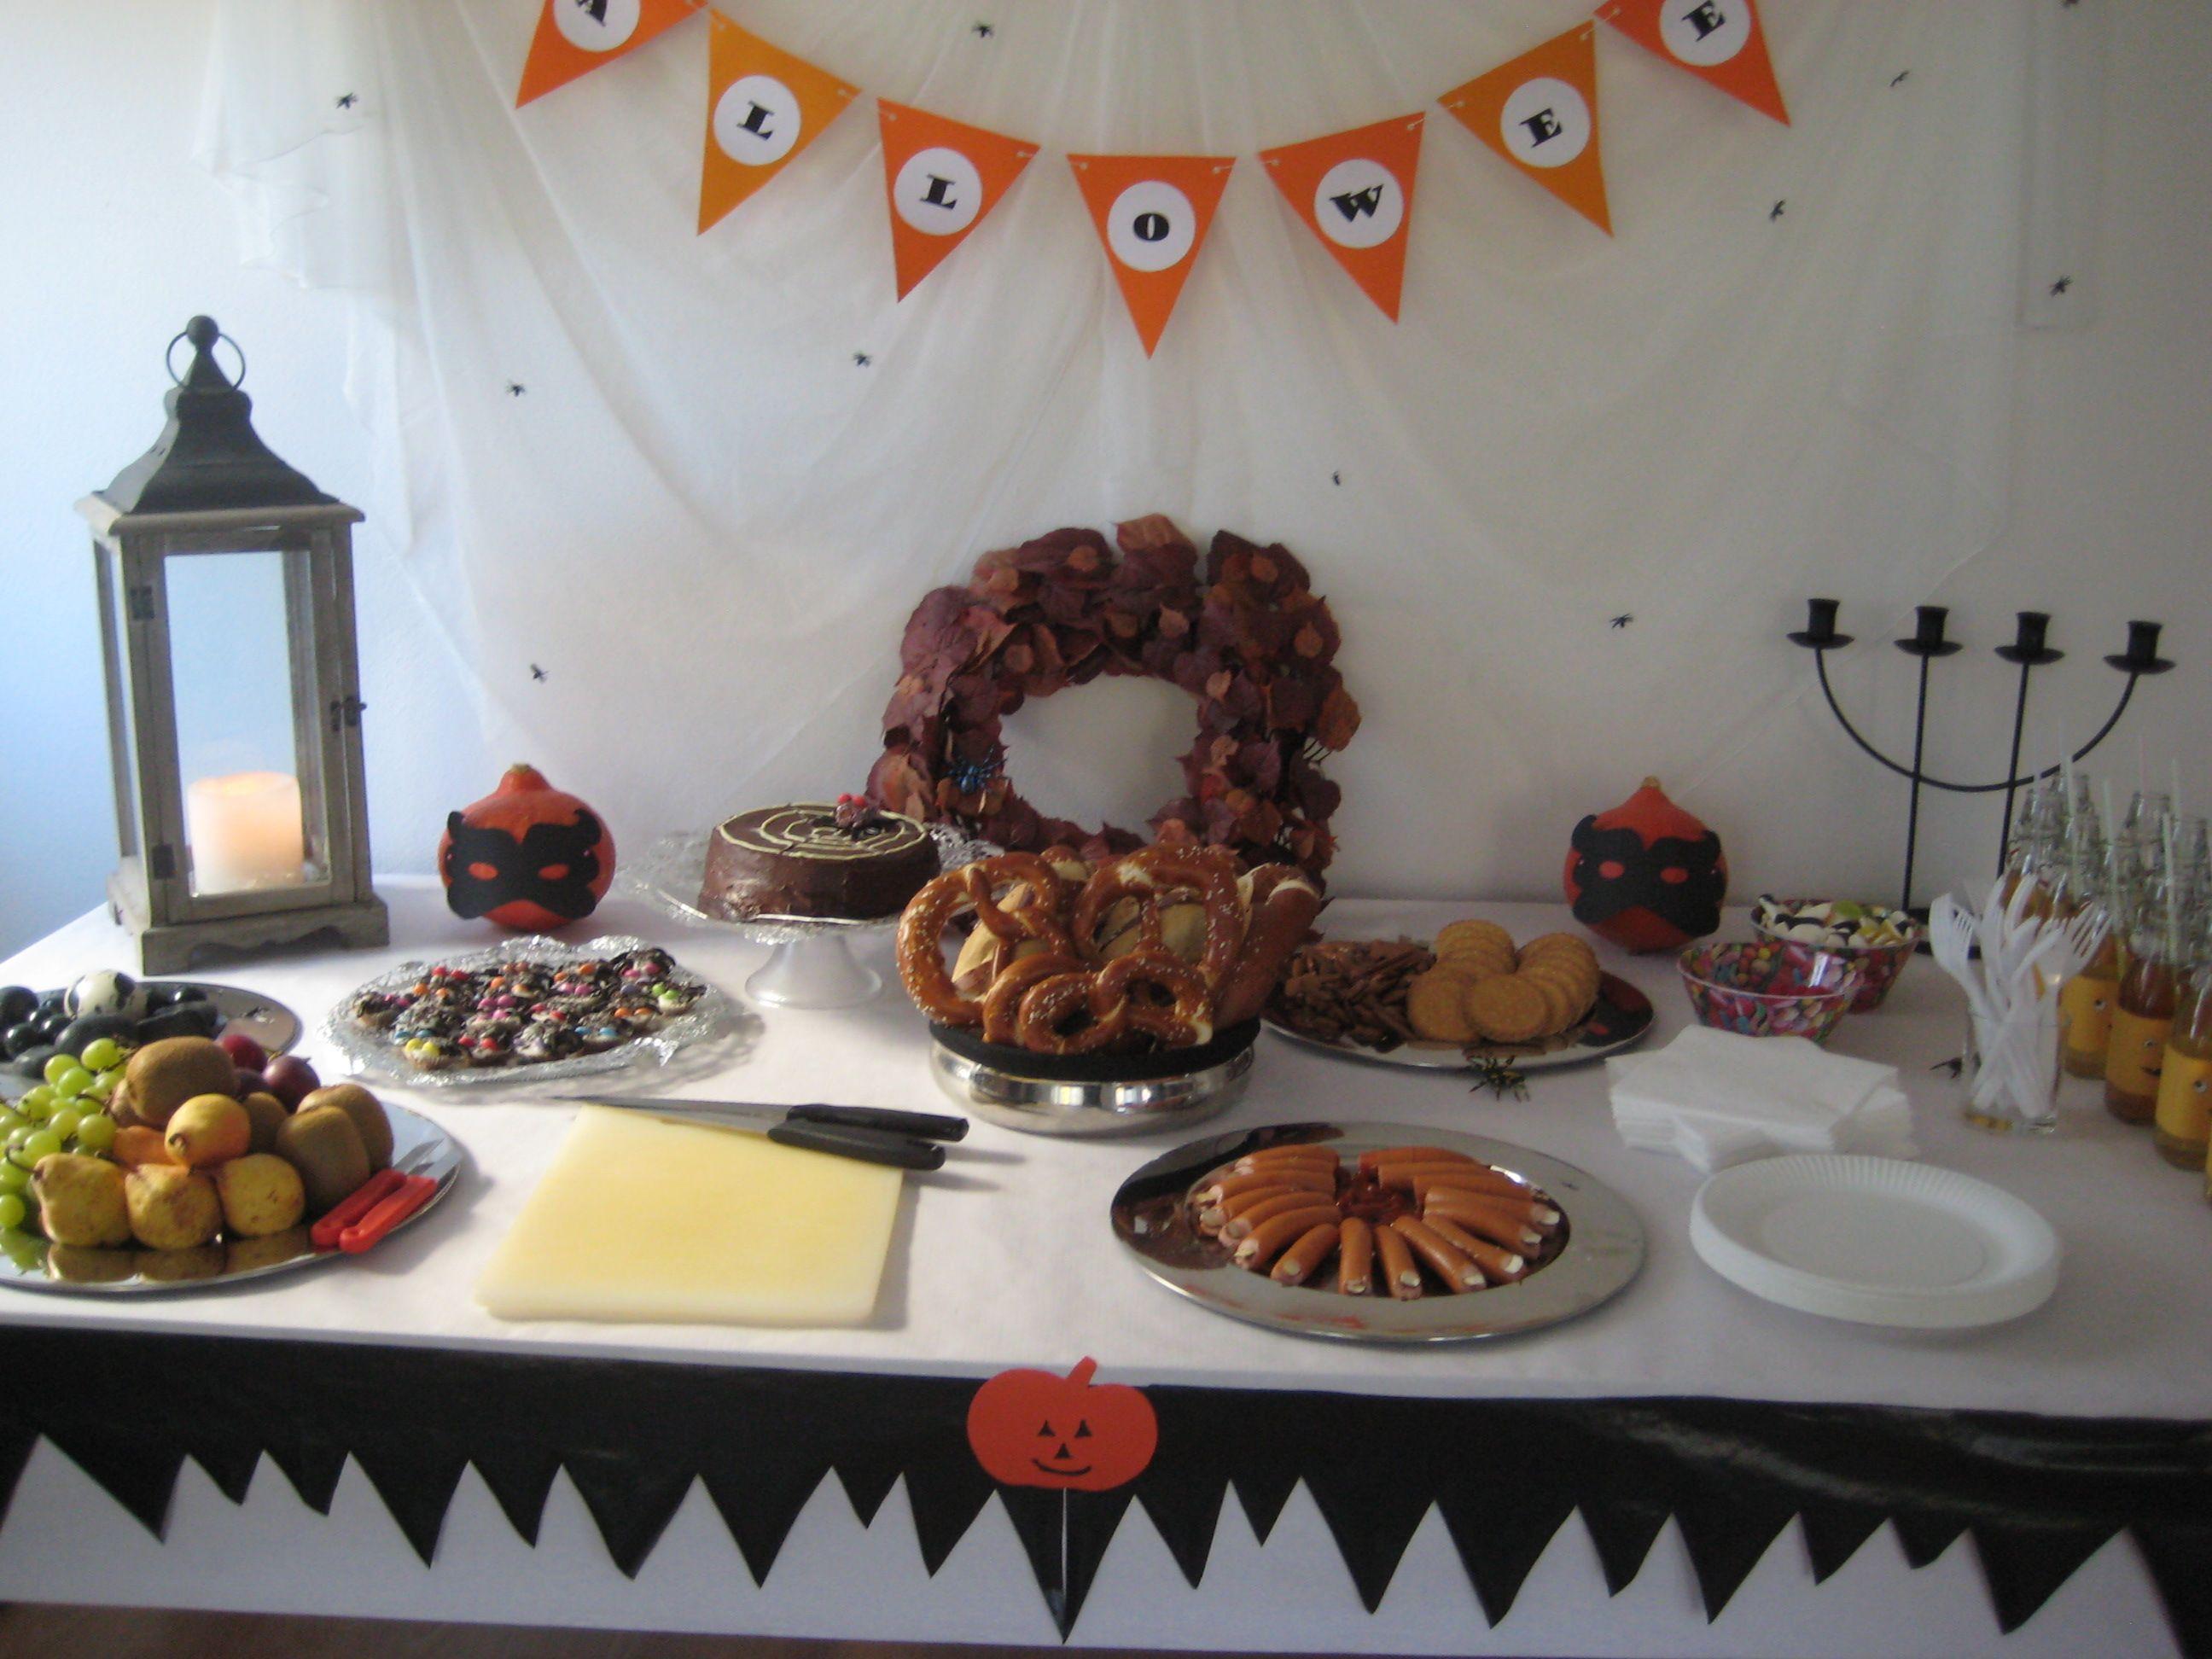 Halloween breakfast table